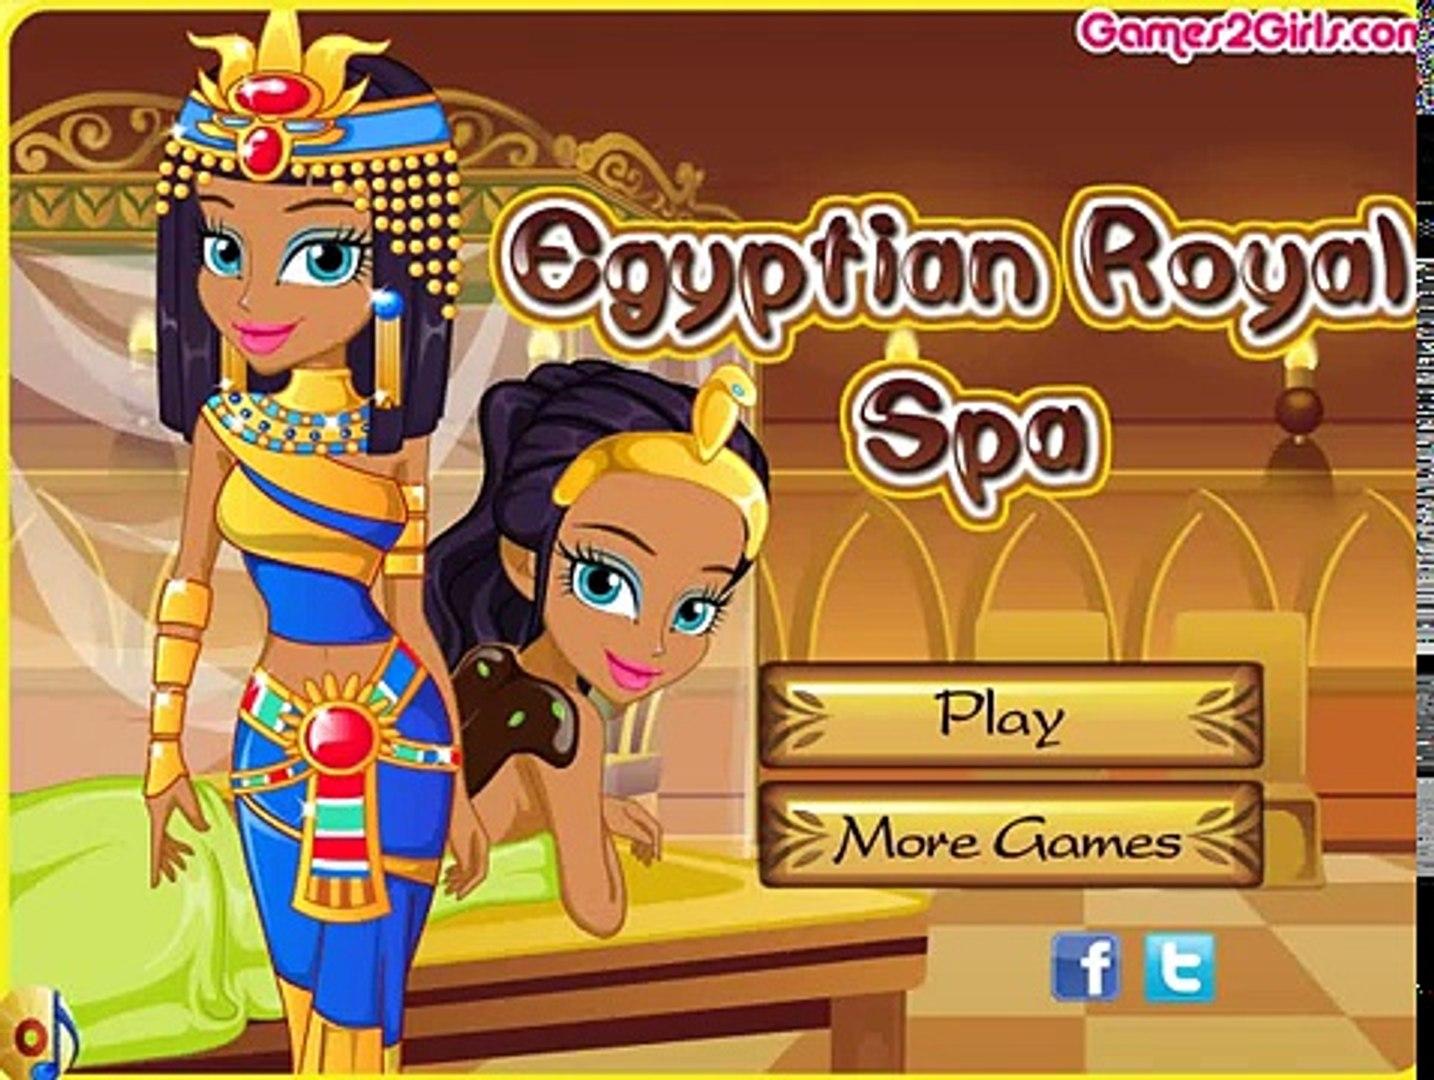 Egyptian Royal Spa/Египетская Королева в Салоне Красоты